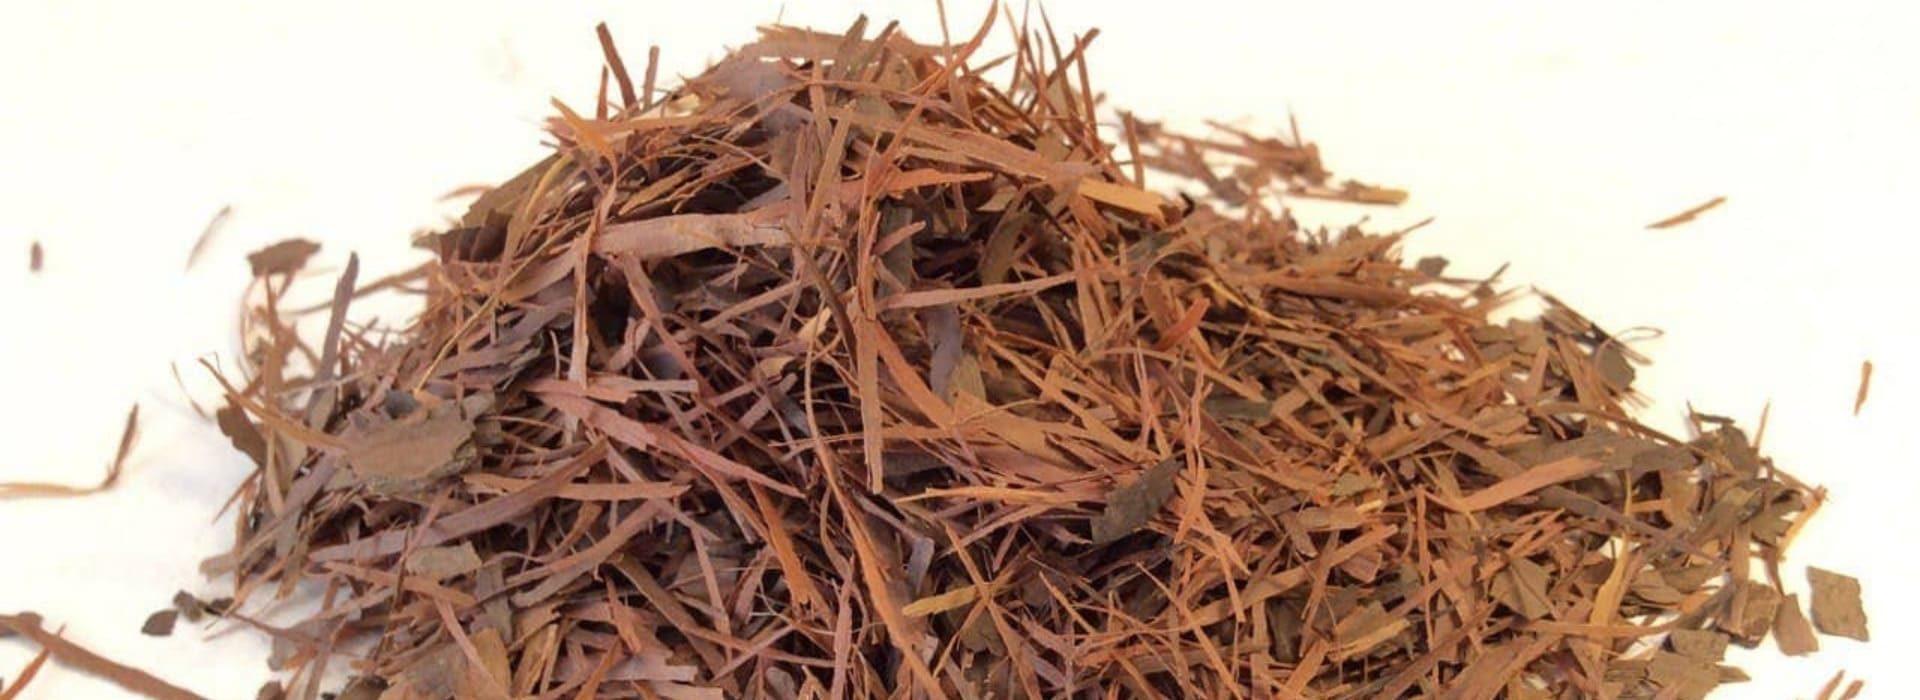 Кора муравьиного дерева (Пау Дарко)